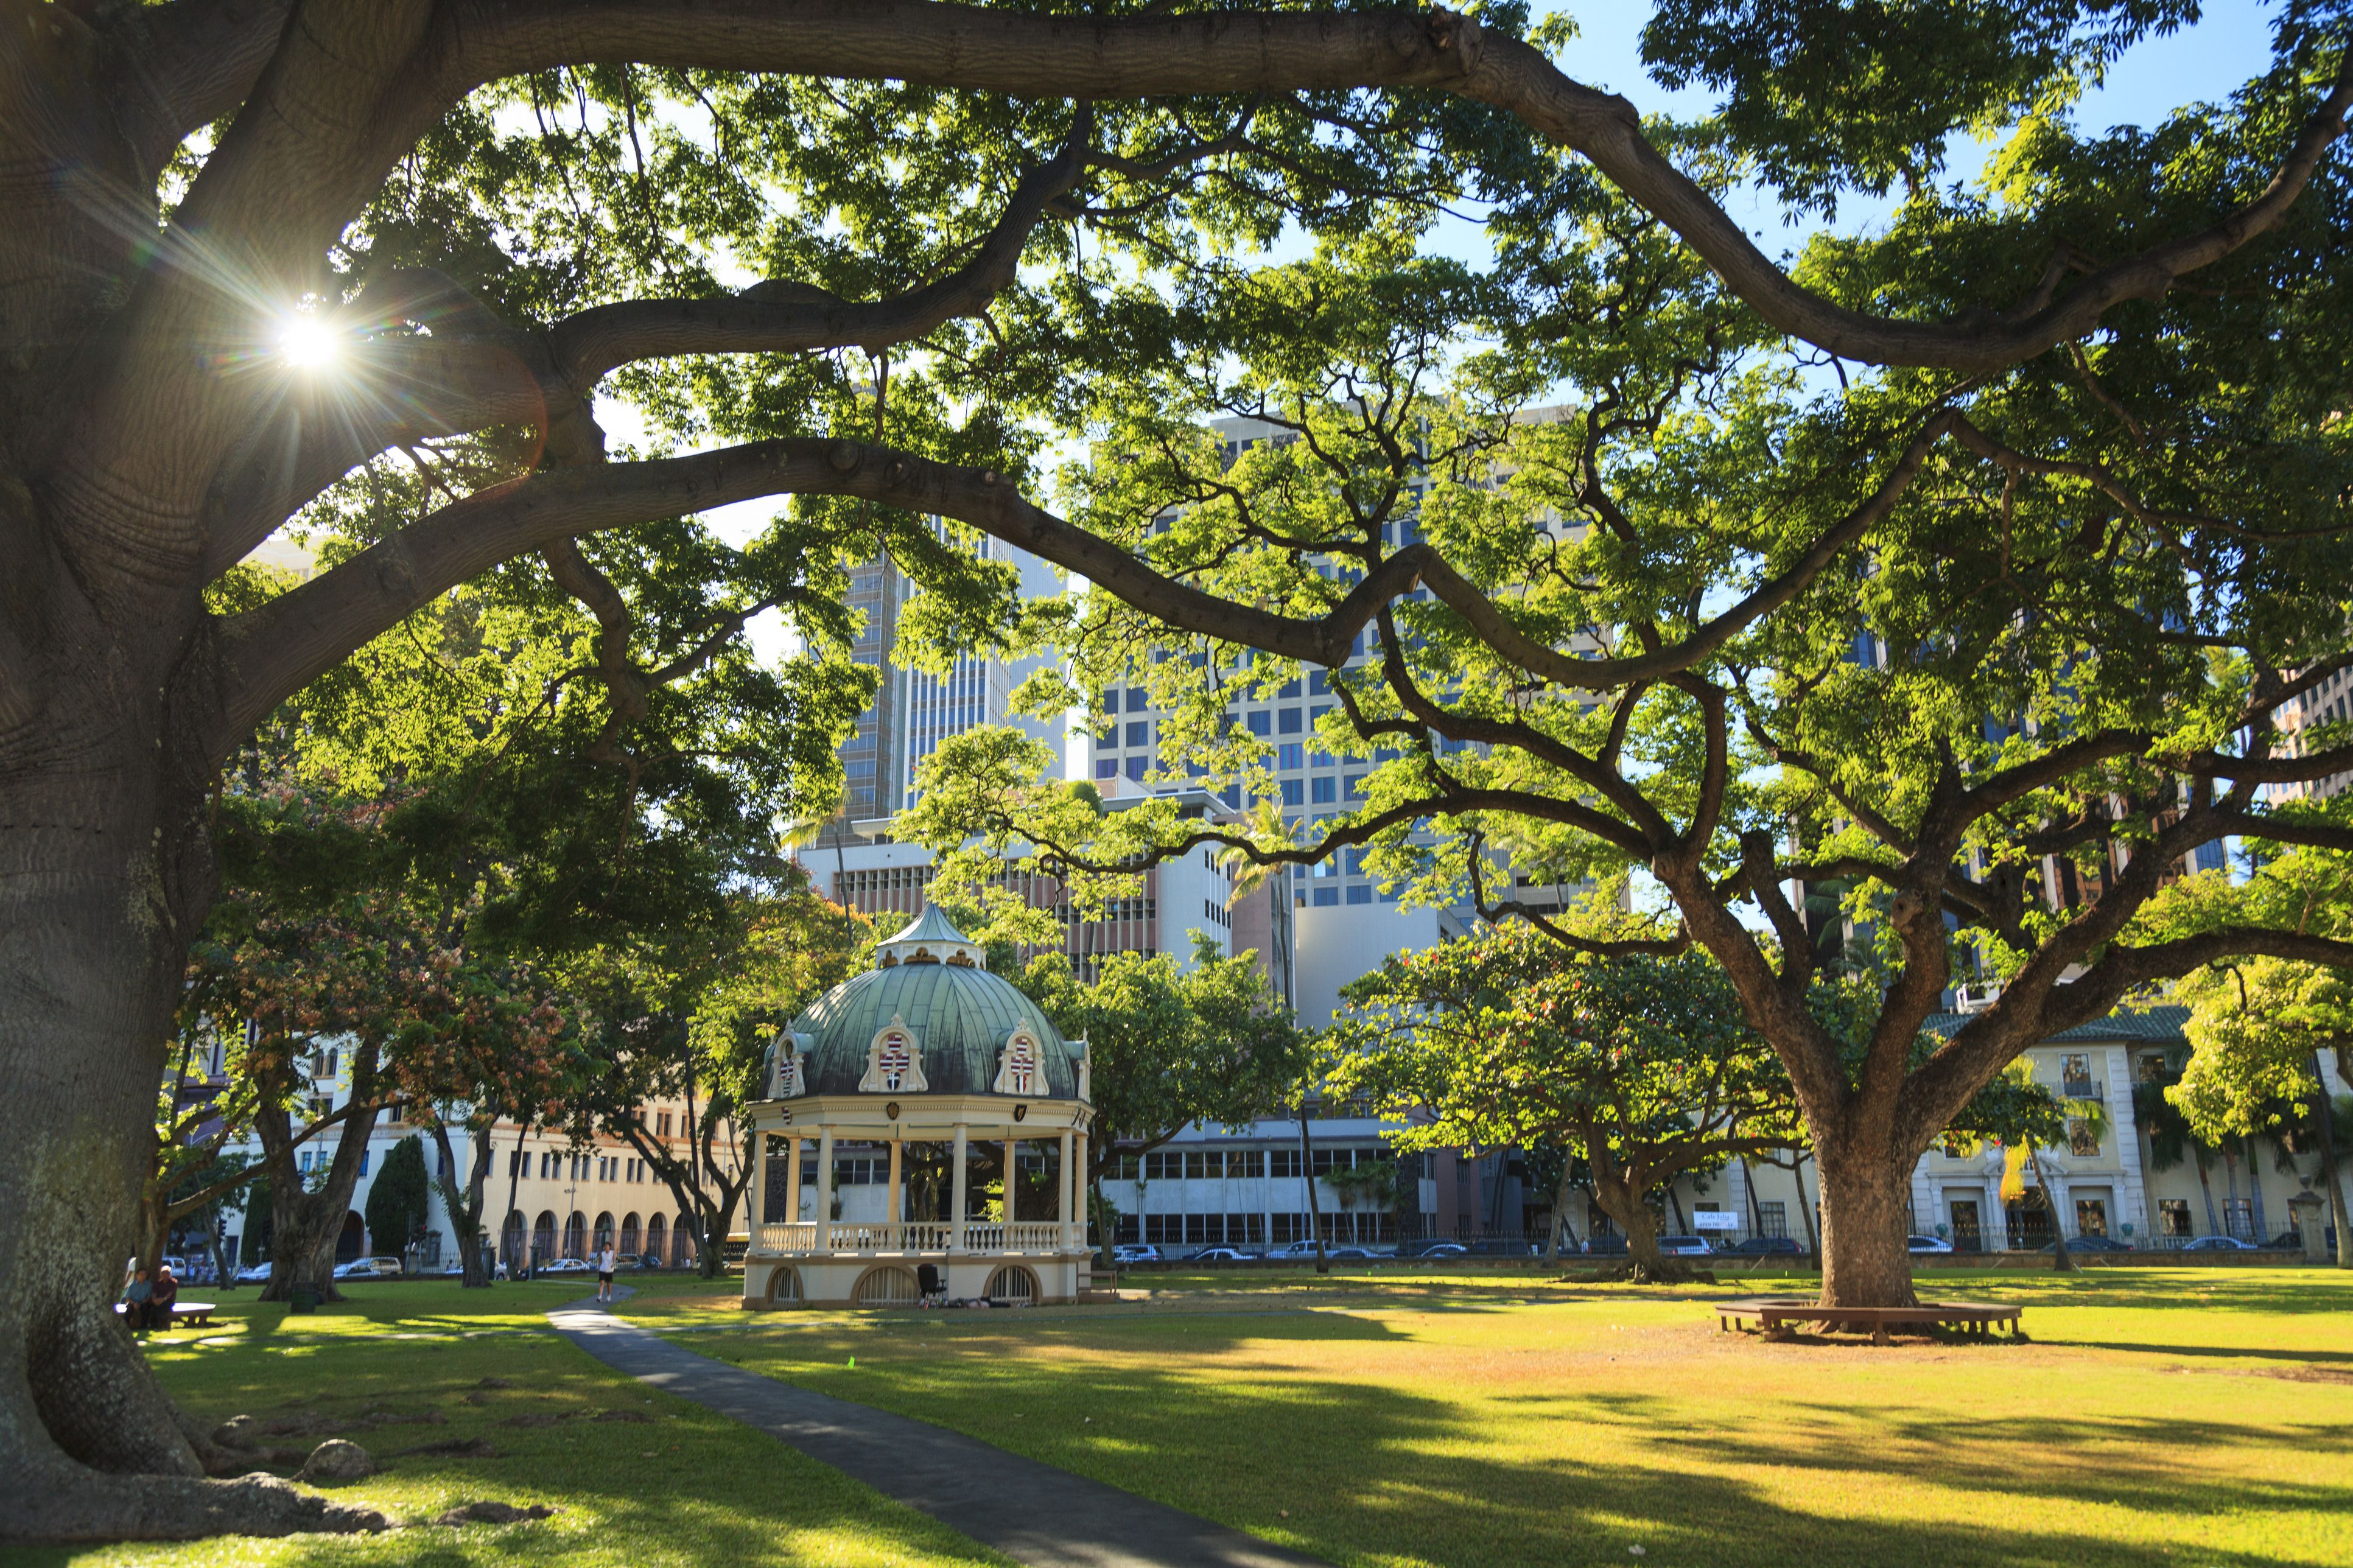 Honolulu, Iolani Royal Palace